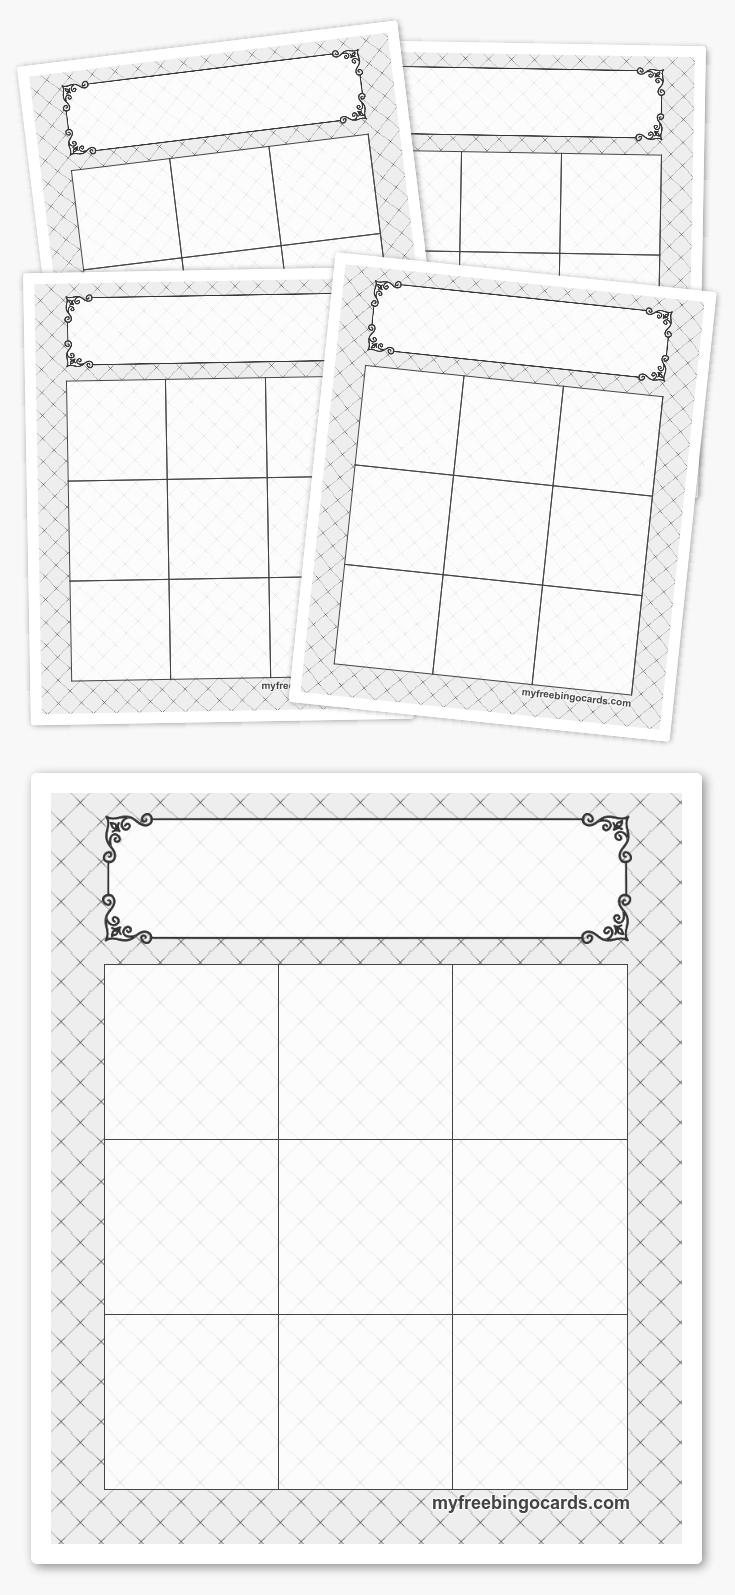 Free Printable 3X3 Bingo Templates | Feladatlapok